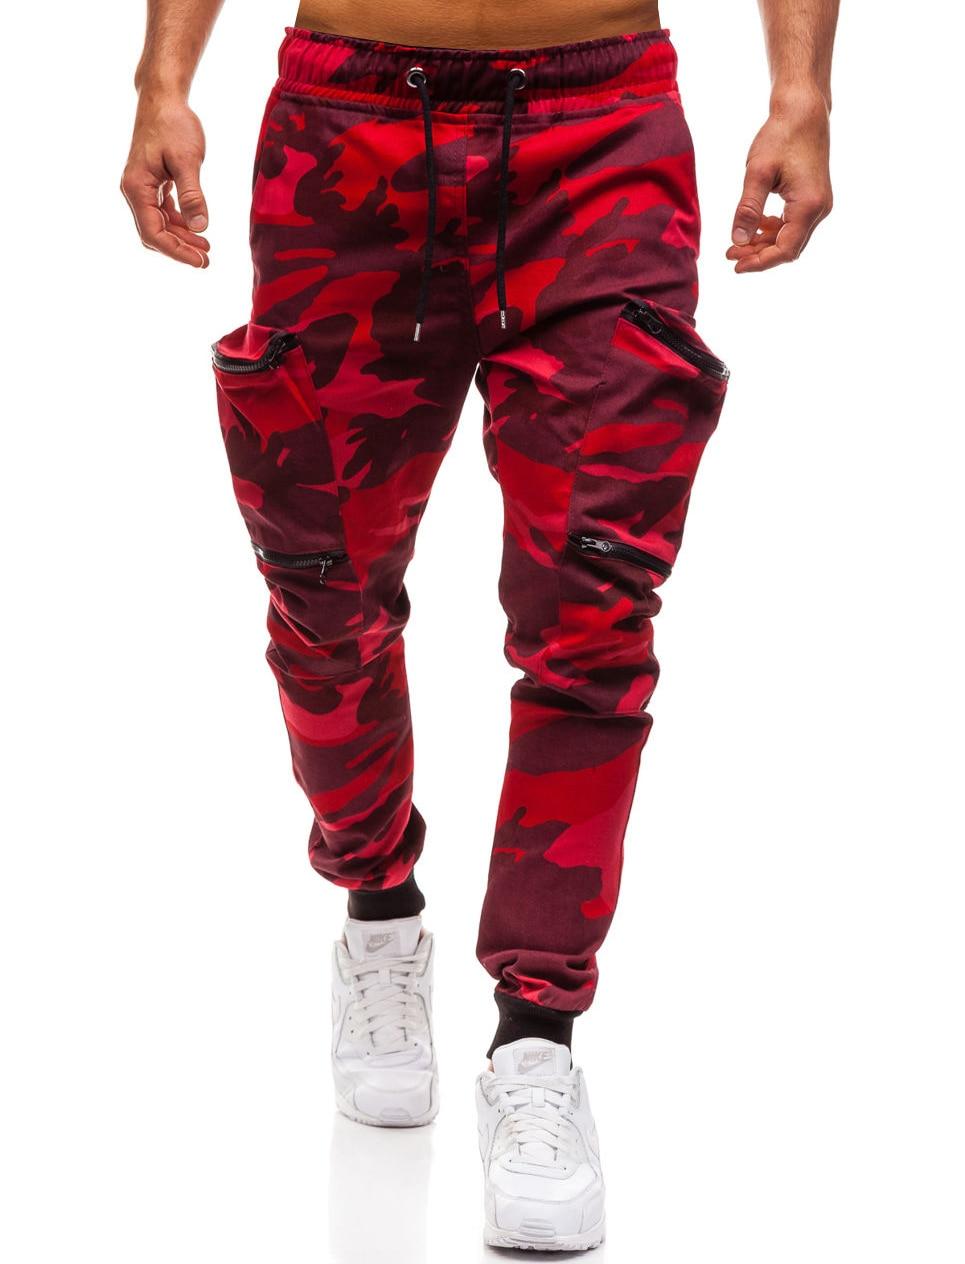 HTB1YV2sL4jaK1RjSZFAq6zdLFXaC Mens Joggers 2019 New Red Camouflage Multi-Pockets Cargo Pants Men Cotton Harem Pants Hip Hop Trousers Streetwear XXXL